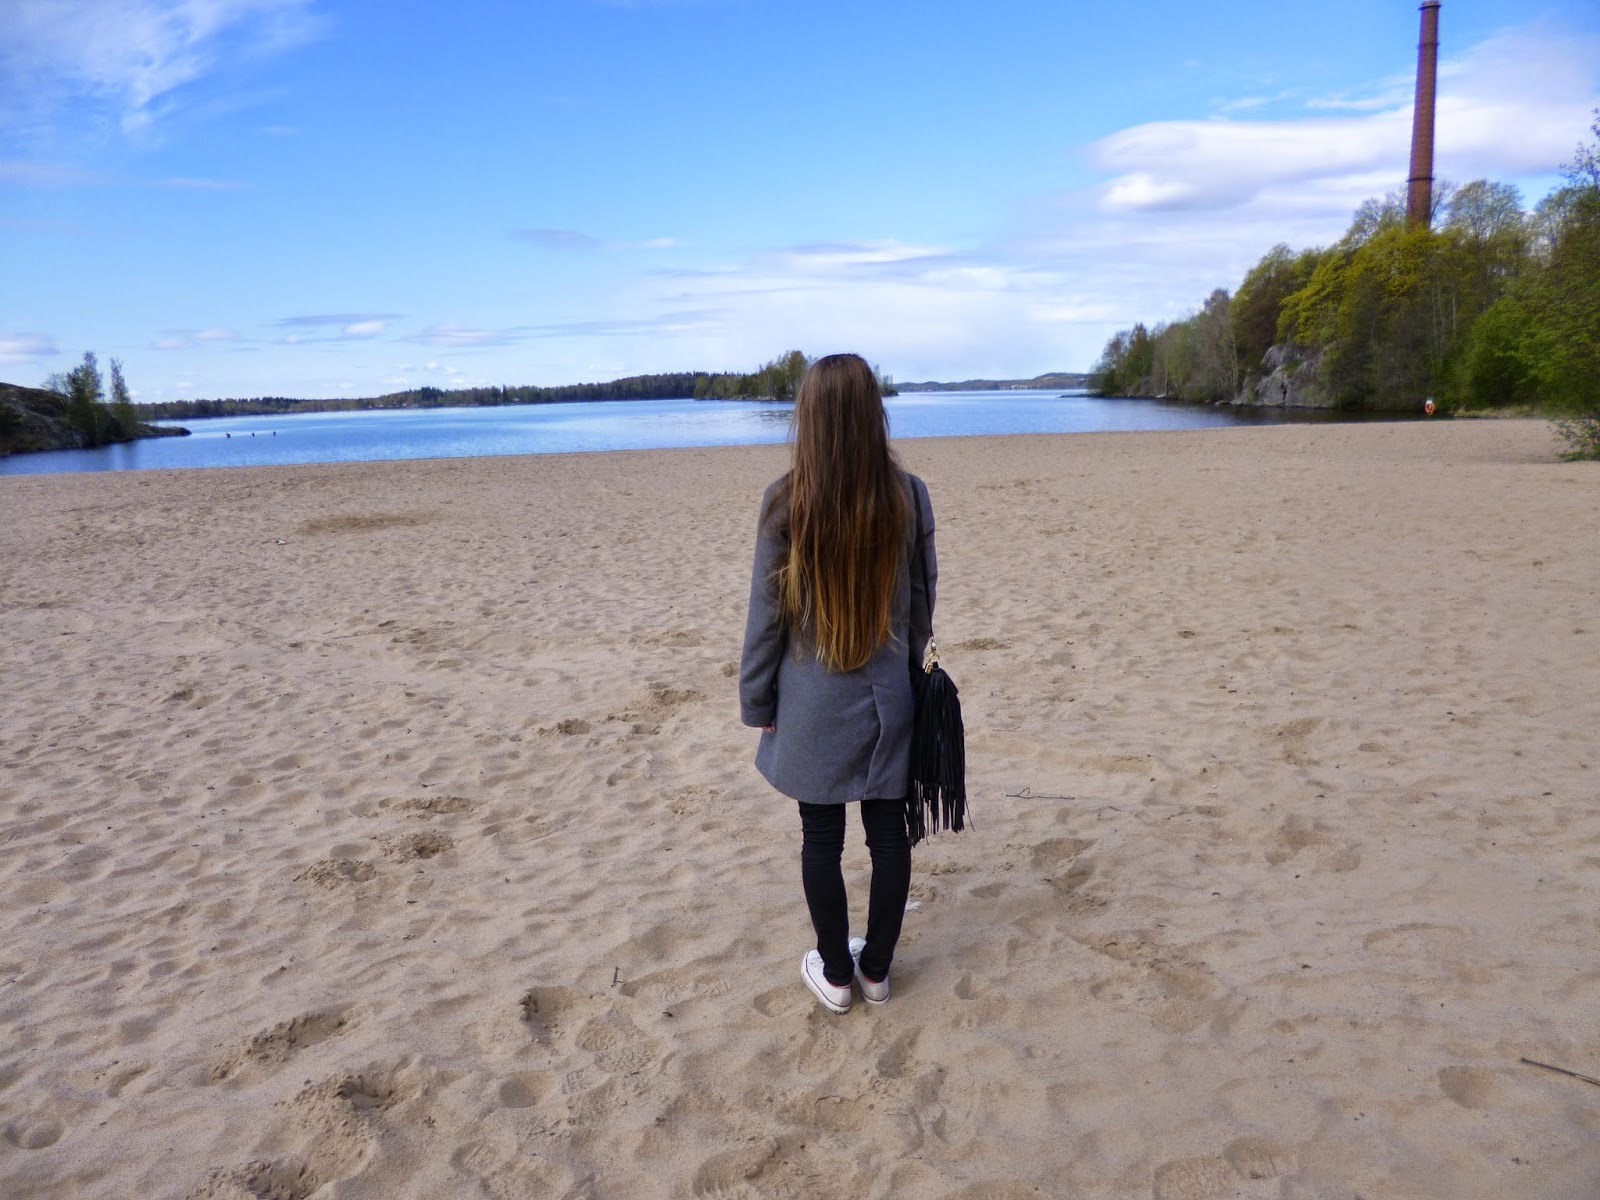 Tampere-pyynikki-beach